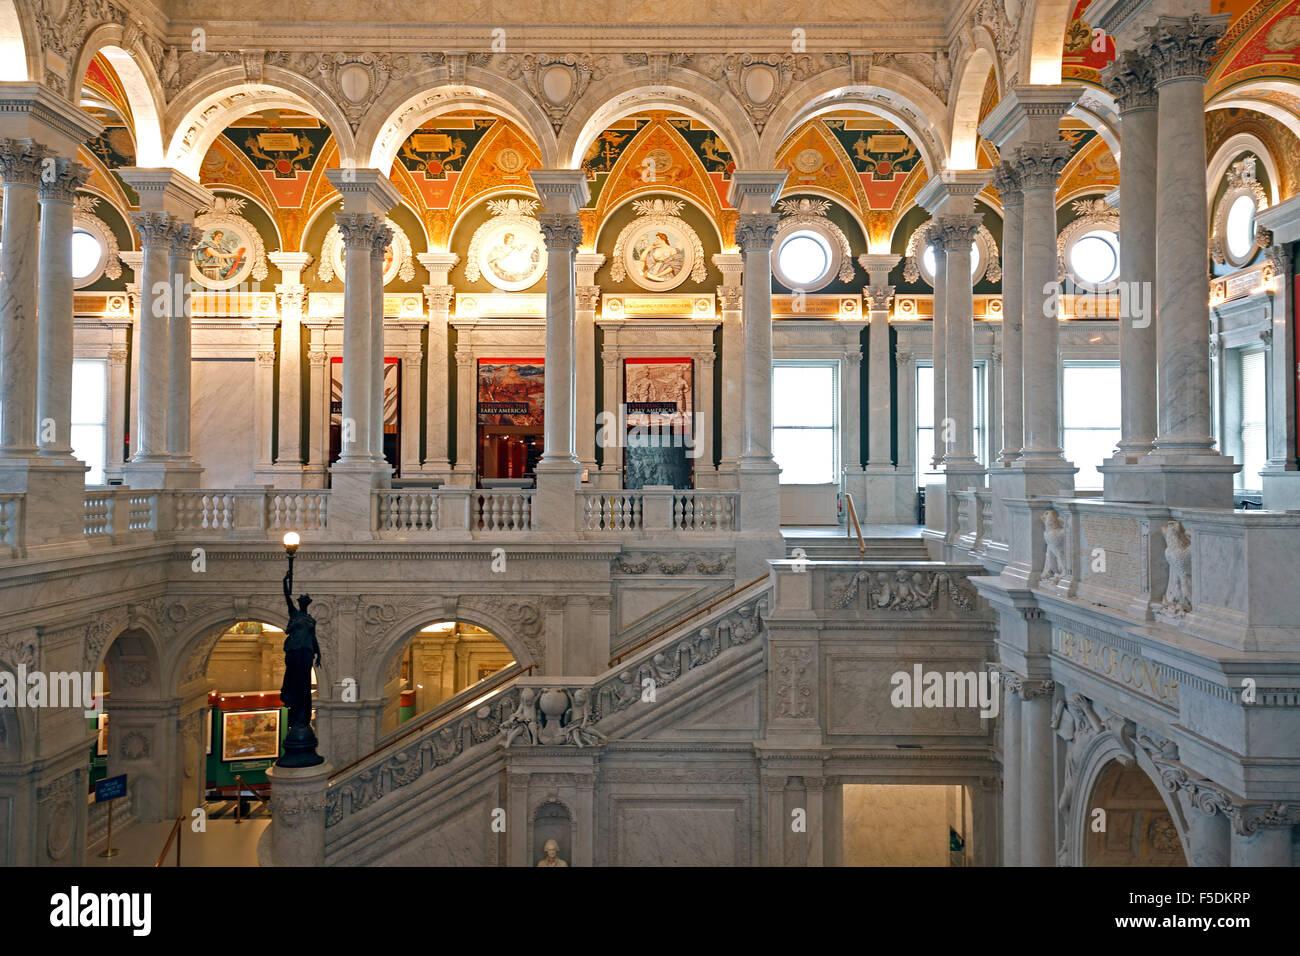 Interieur, Bibliothek des Kongresses, Germany Stockbild